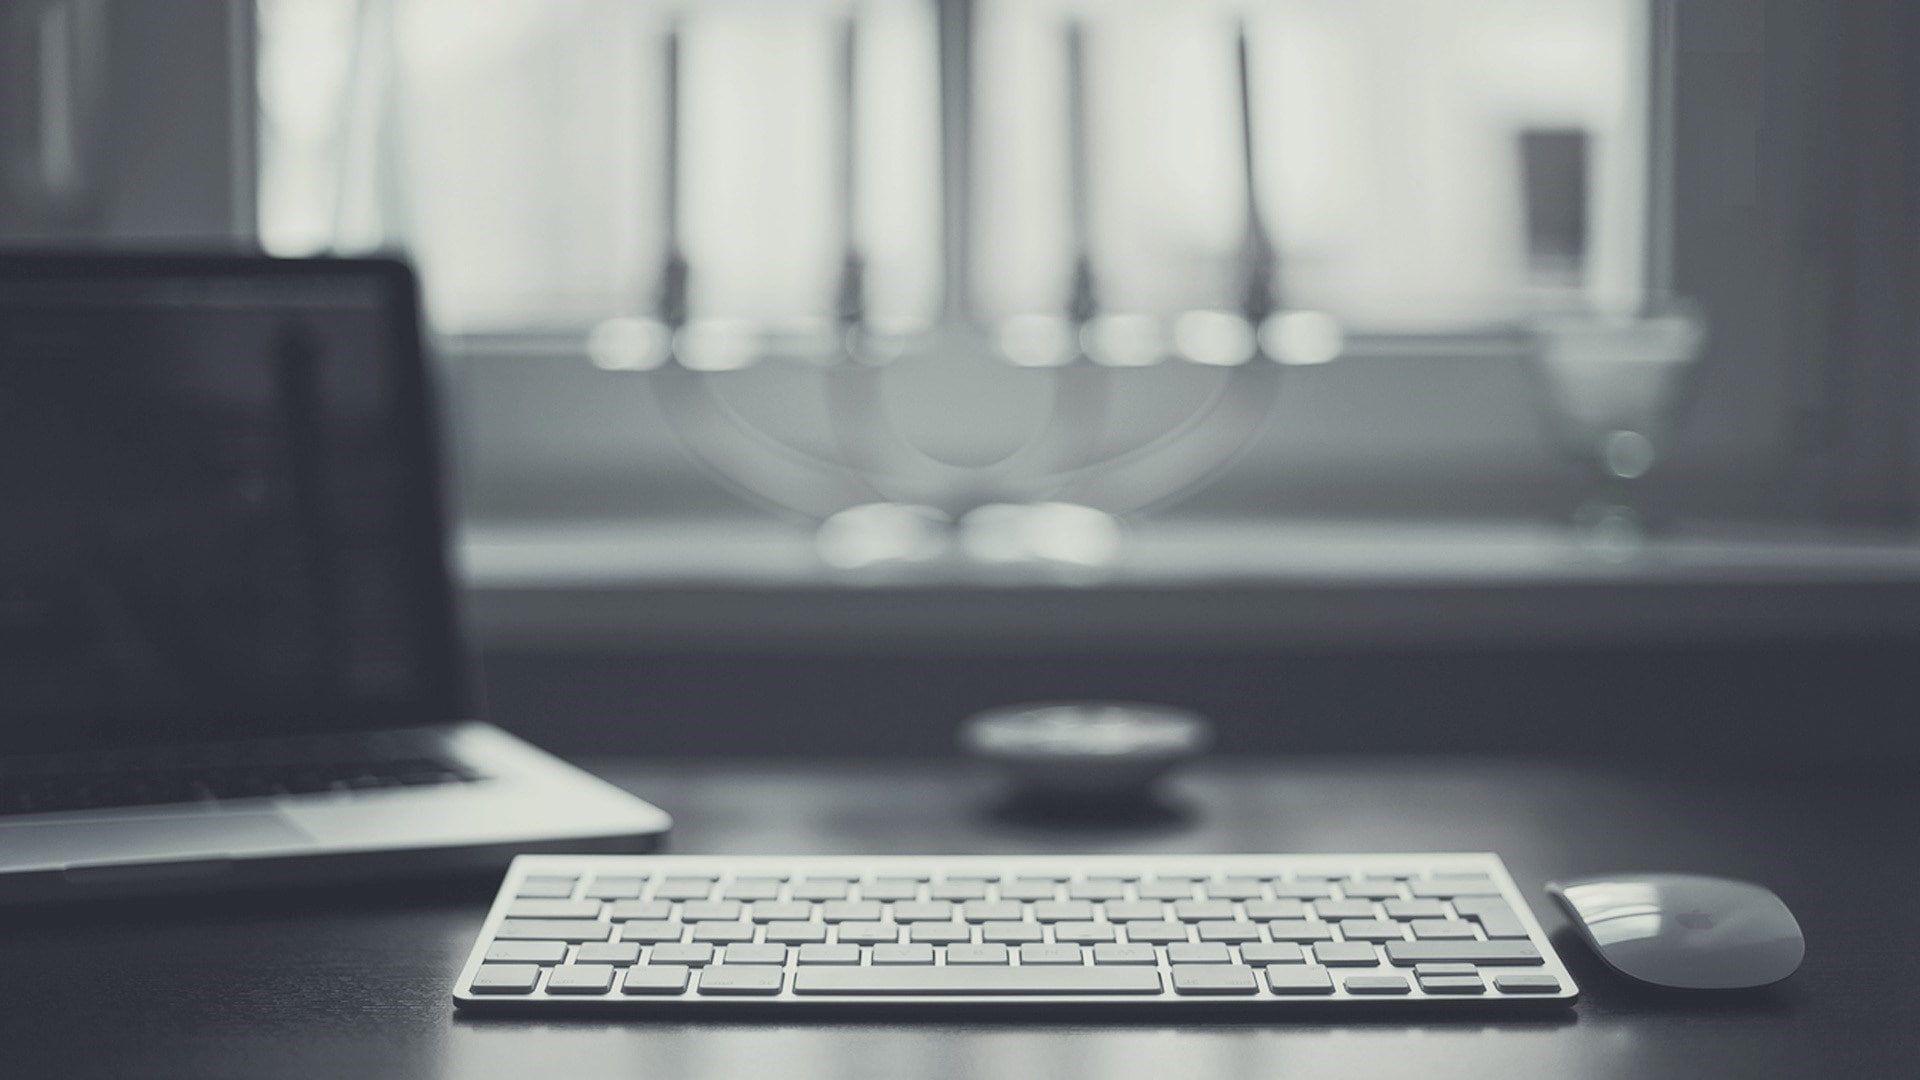 Keyboard Technics Computer Key Notebook Laptop Device Technology Business Office In In 2020 Minimalist Web Design Web Design Examples Web Development Design